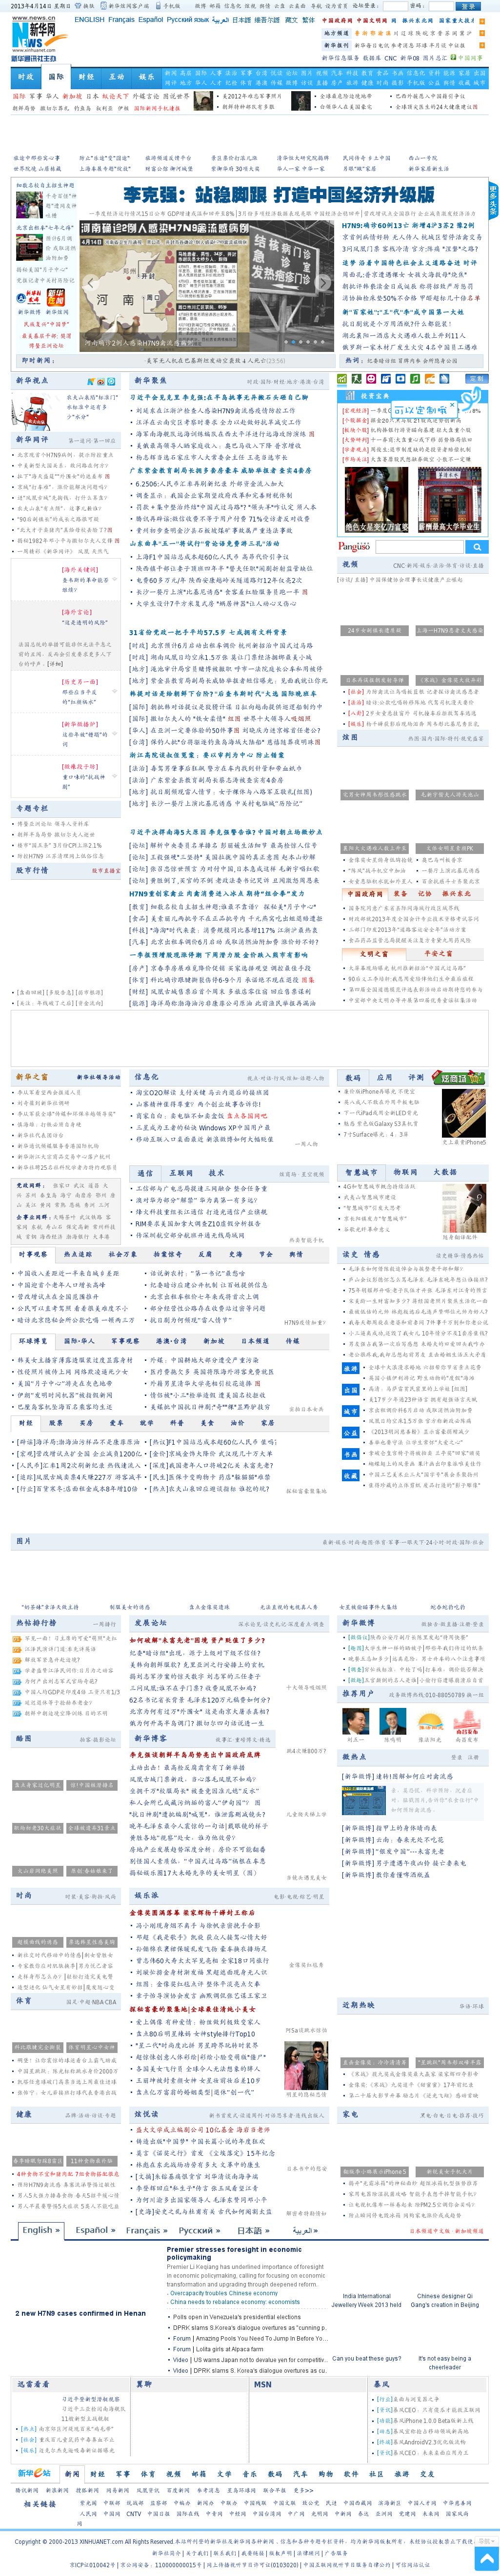 Xinhua at Sunday April 14, 2013, 4:24 p.m. UTC